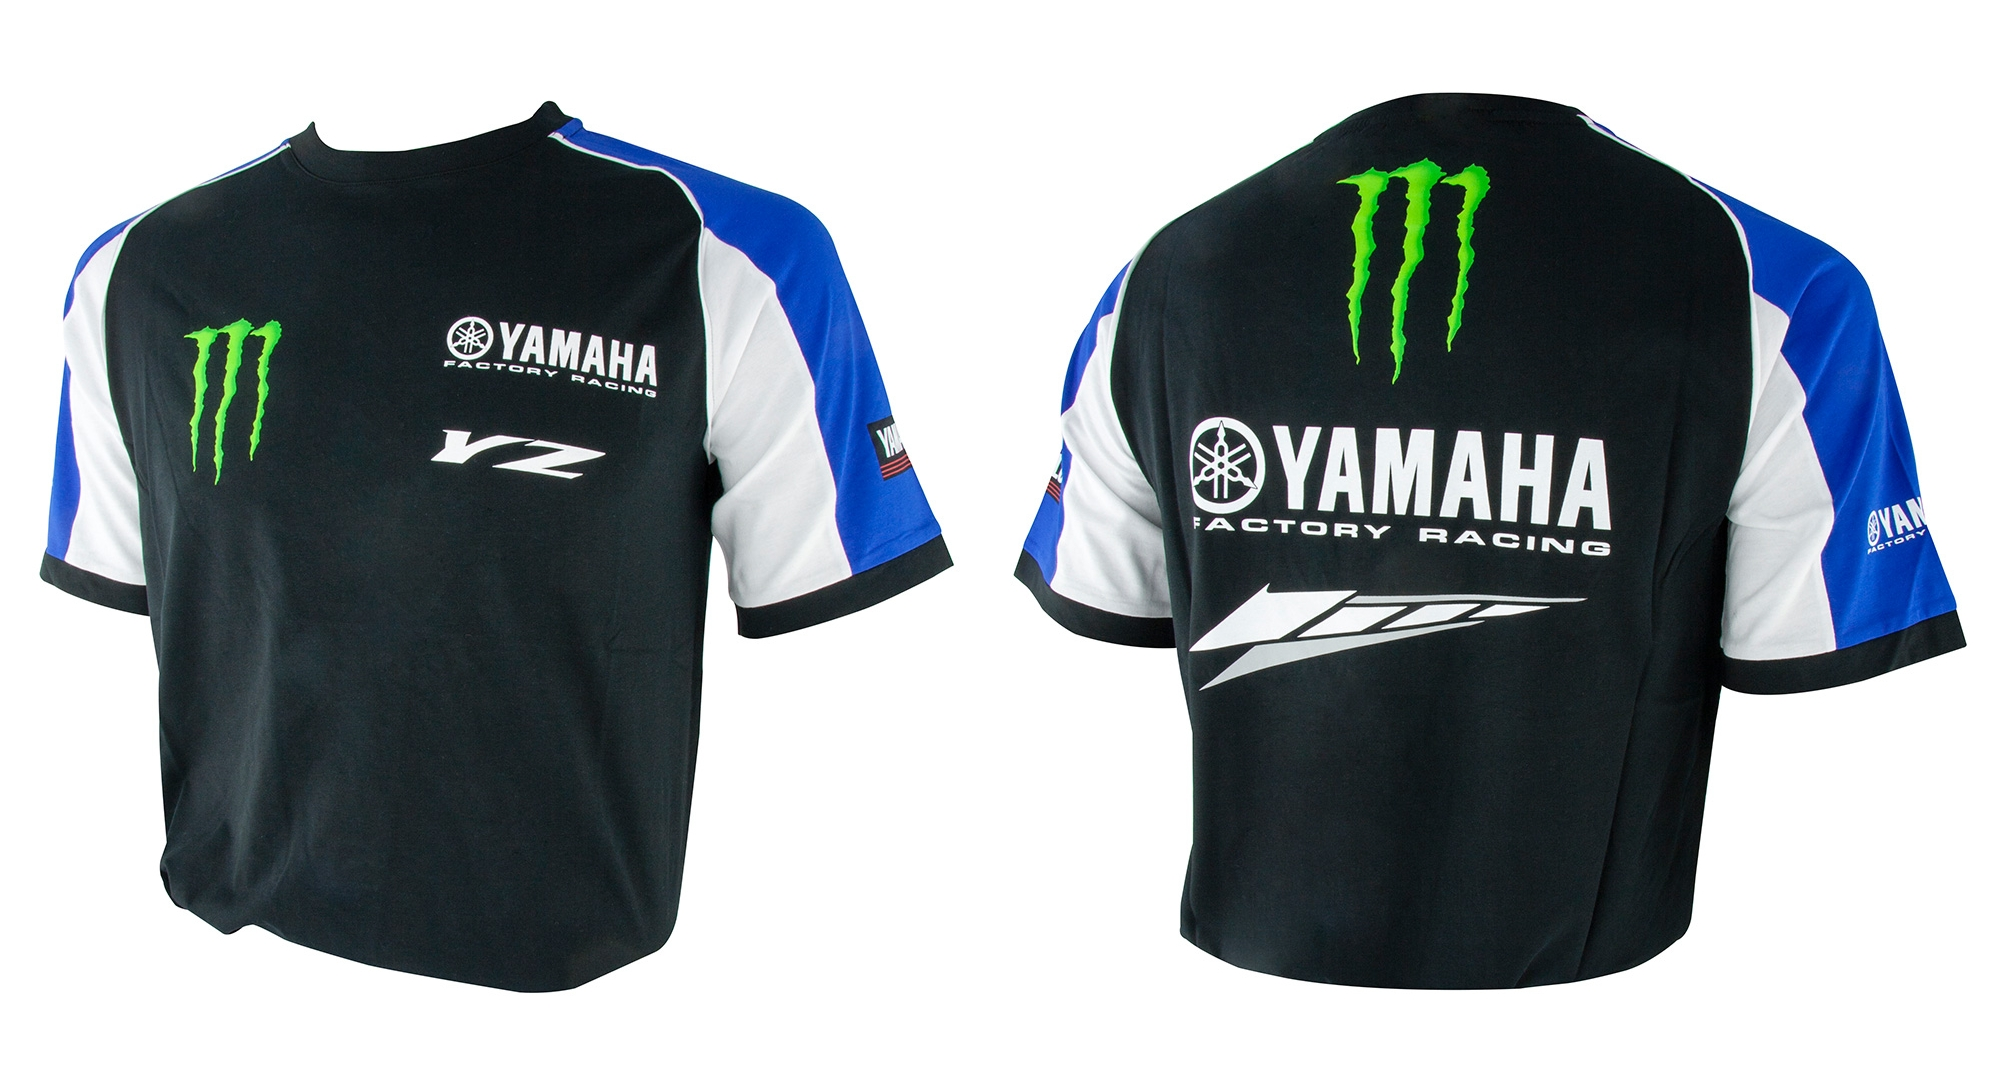 ex team wear motocross mxgp monster yamaha factory racing. Black Bedroom Furniture Sets. Home Design Ideas